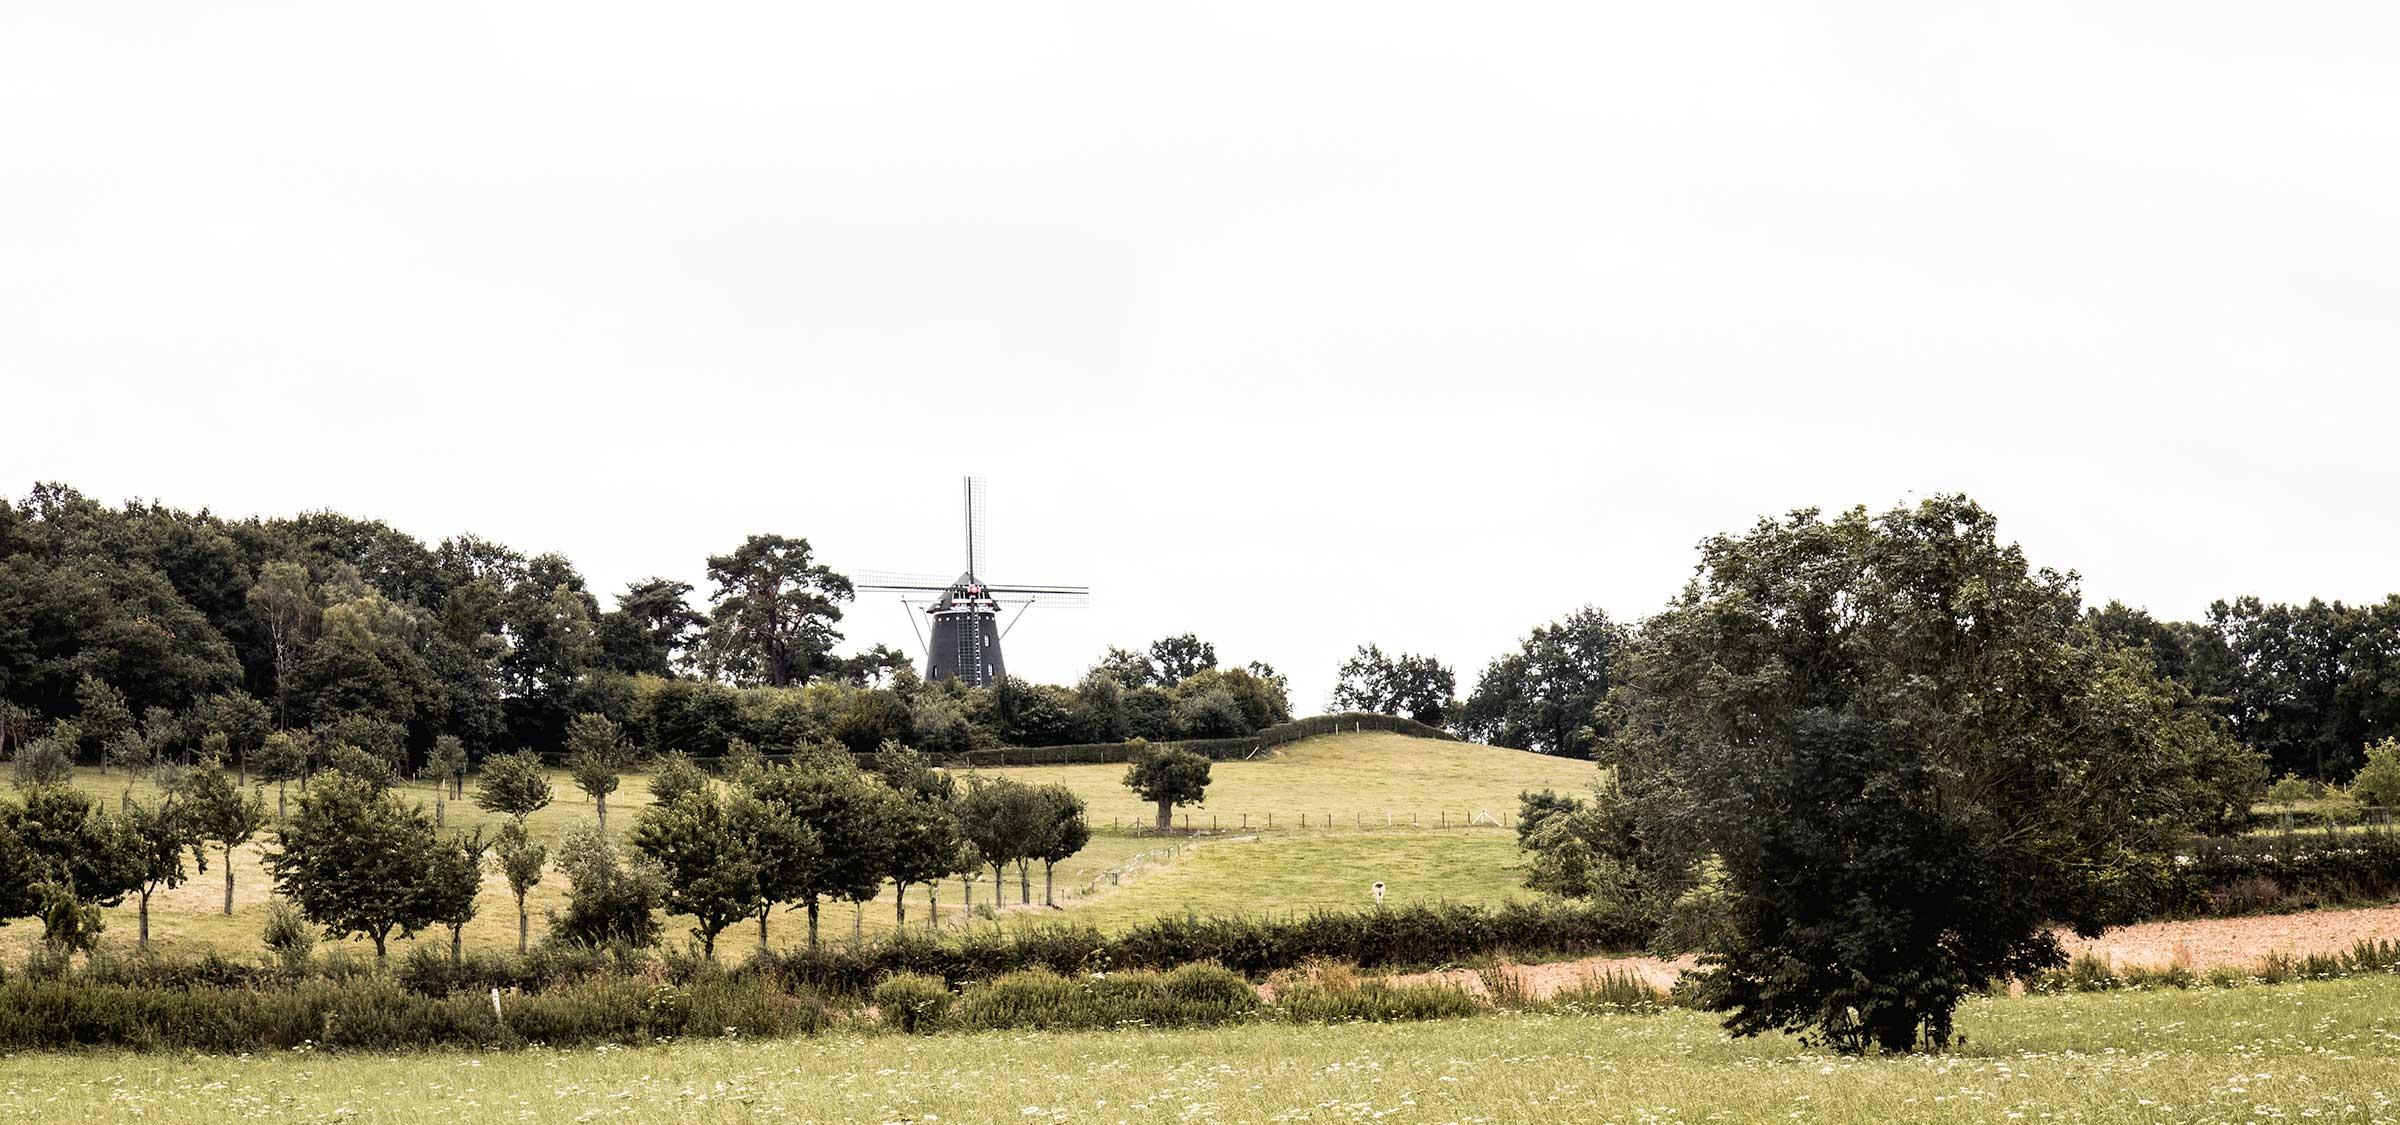 Wanderlust: The Netherlands Travel Tips